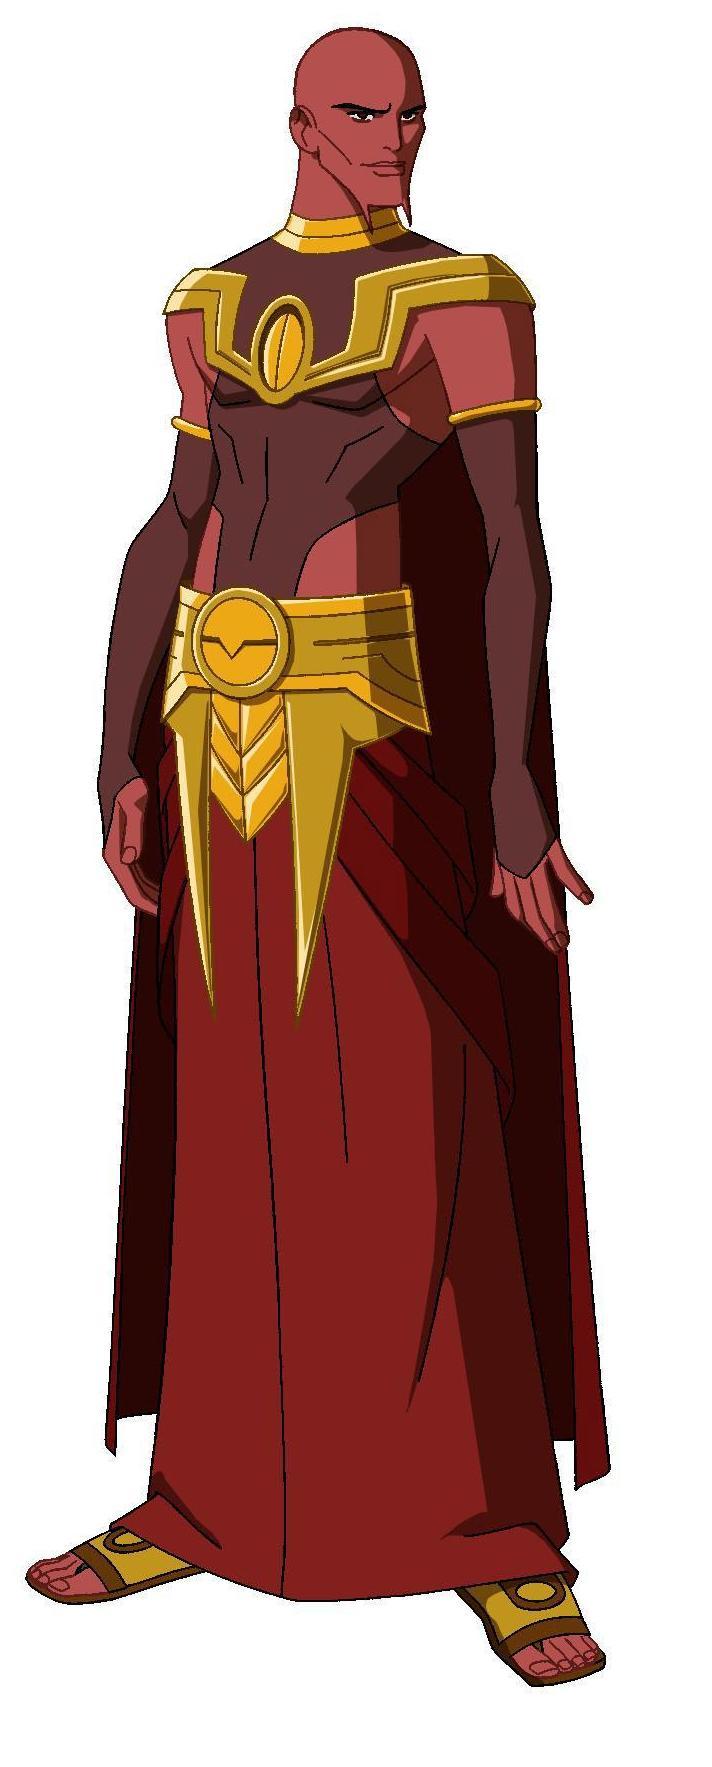 Red King (Marvel)